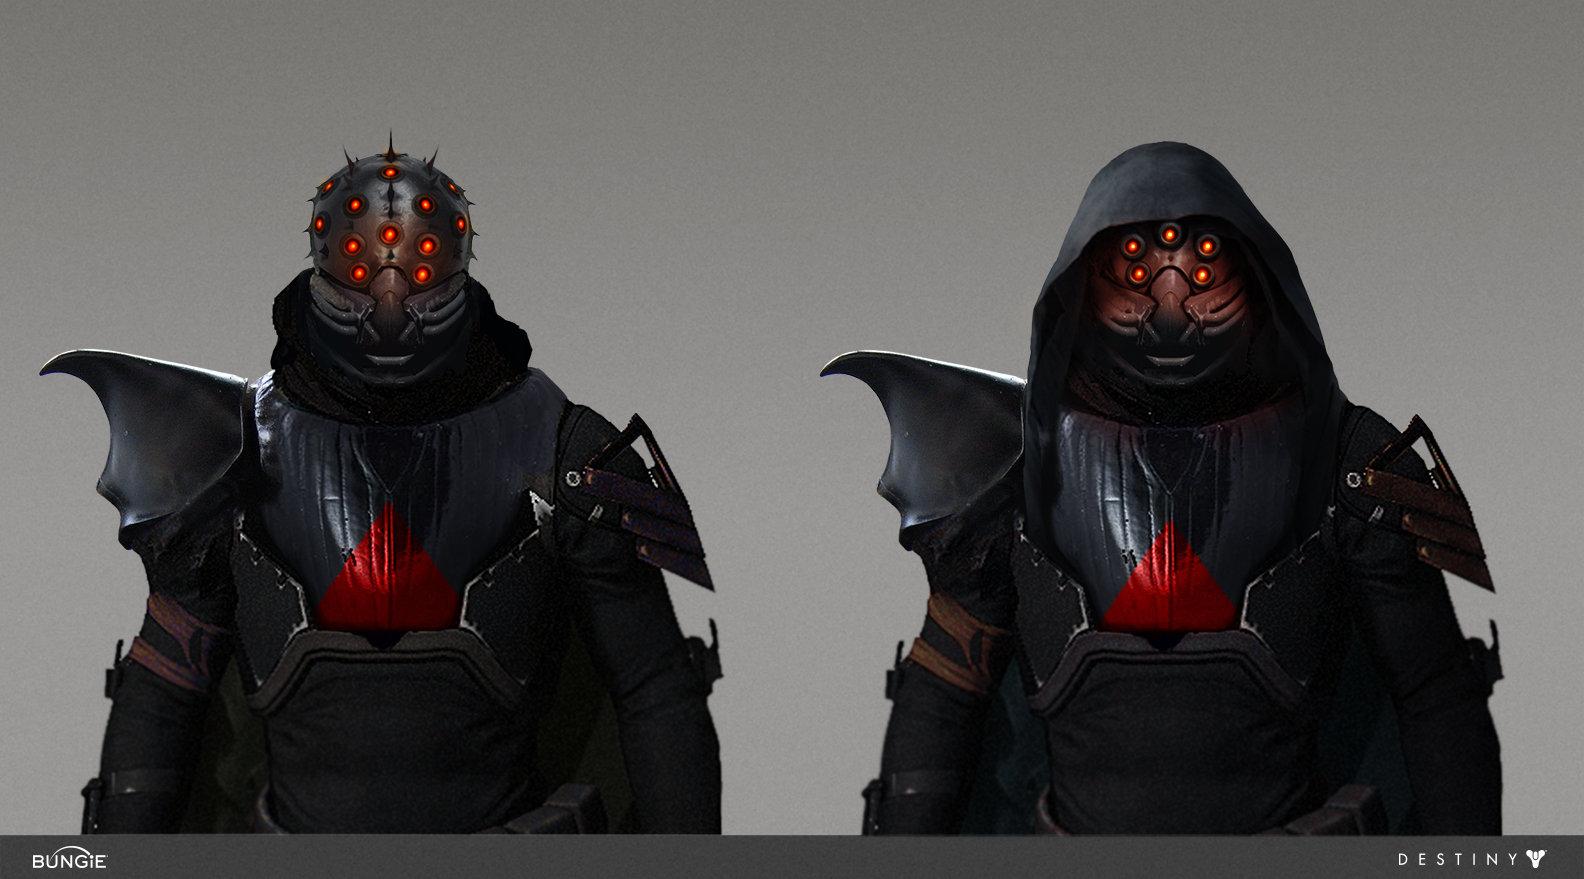 Destiny Concept Art by Joseph Cross